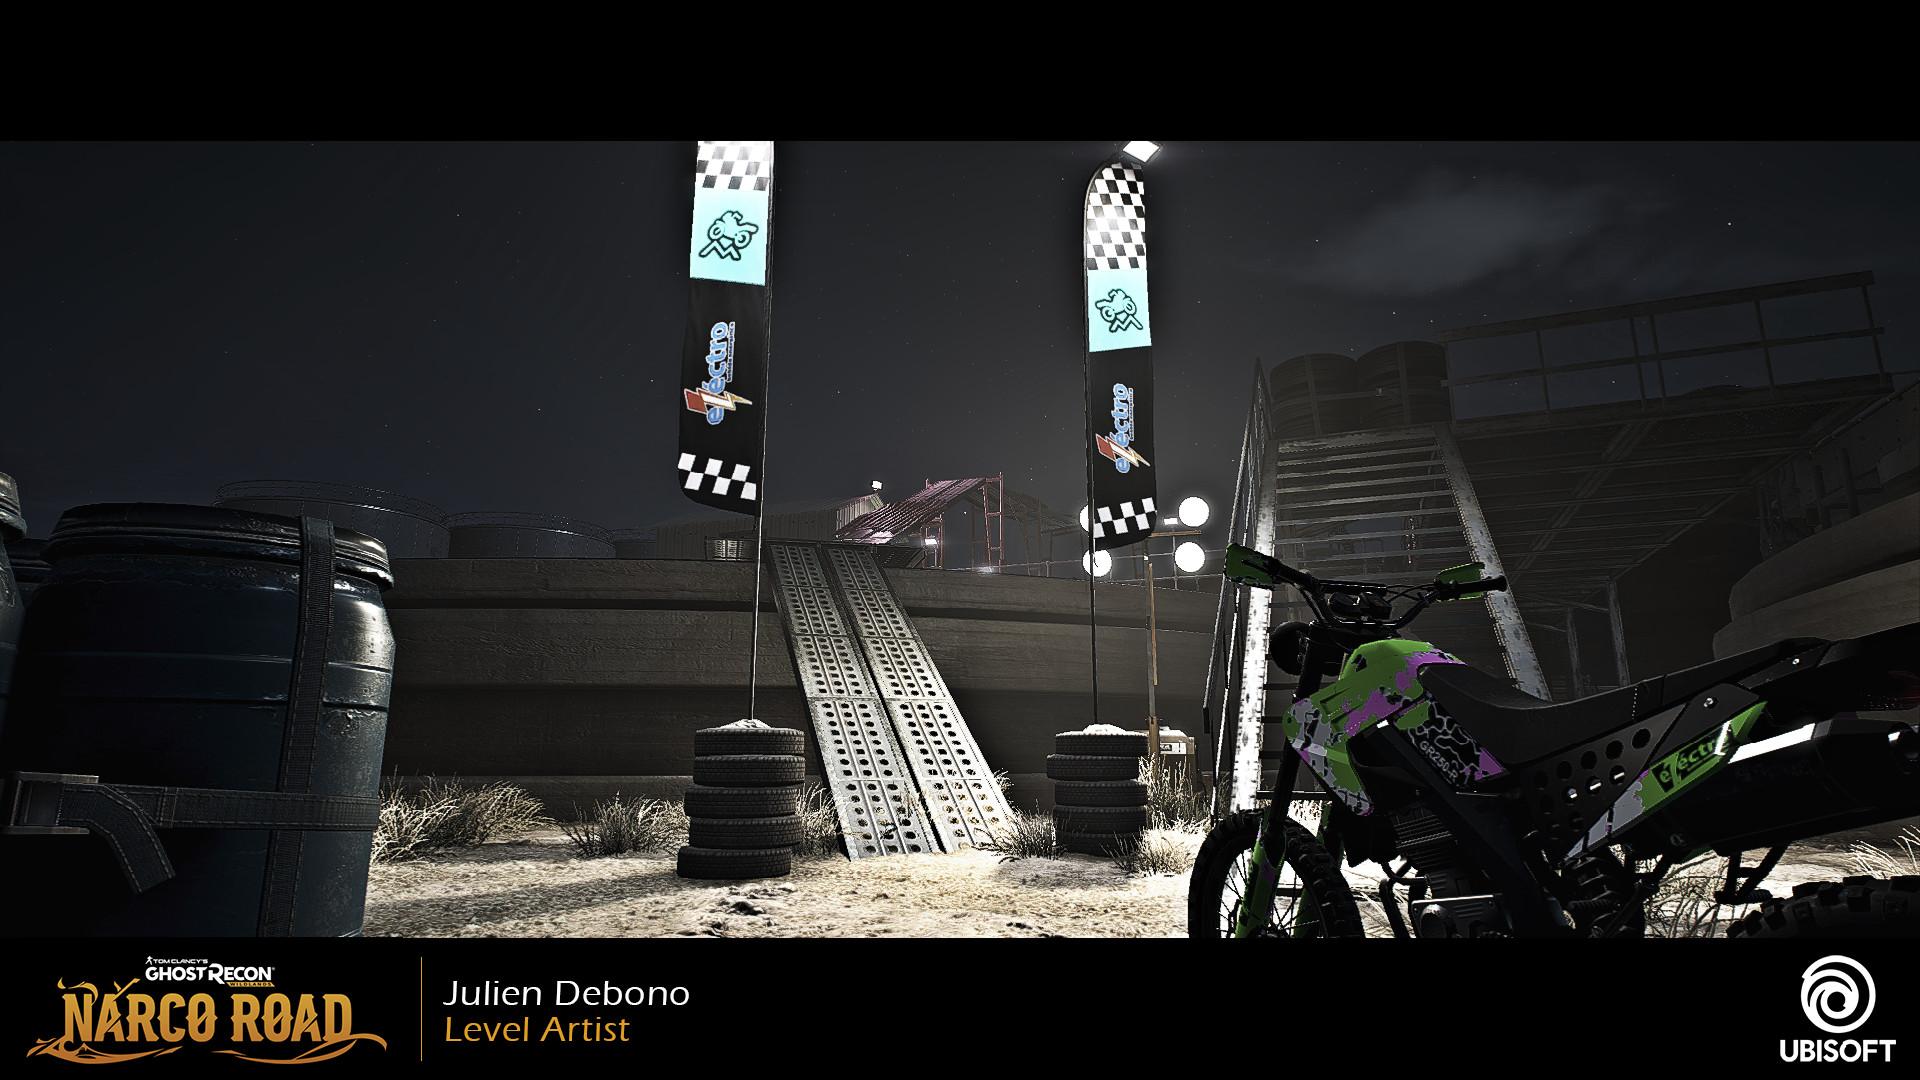 Julien debono sm02trial02 start night